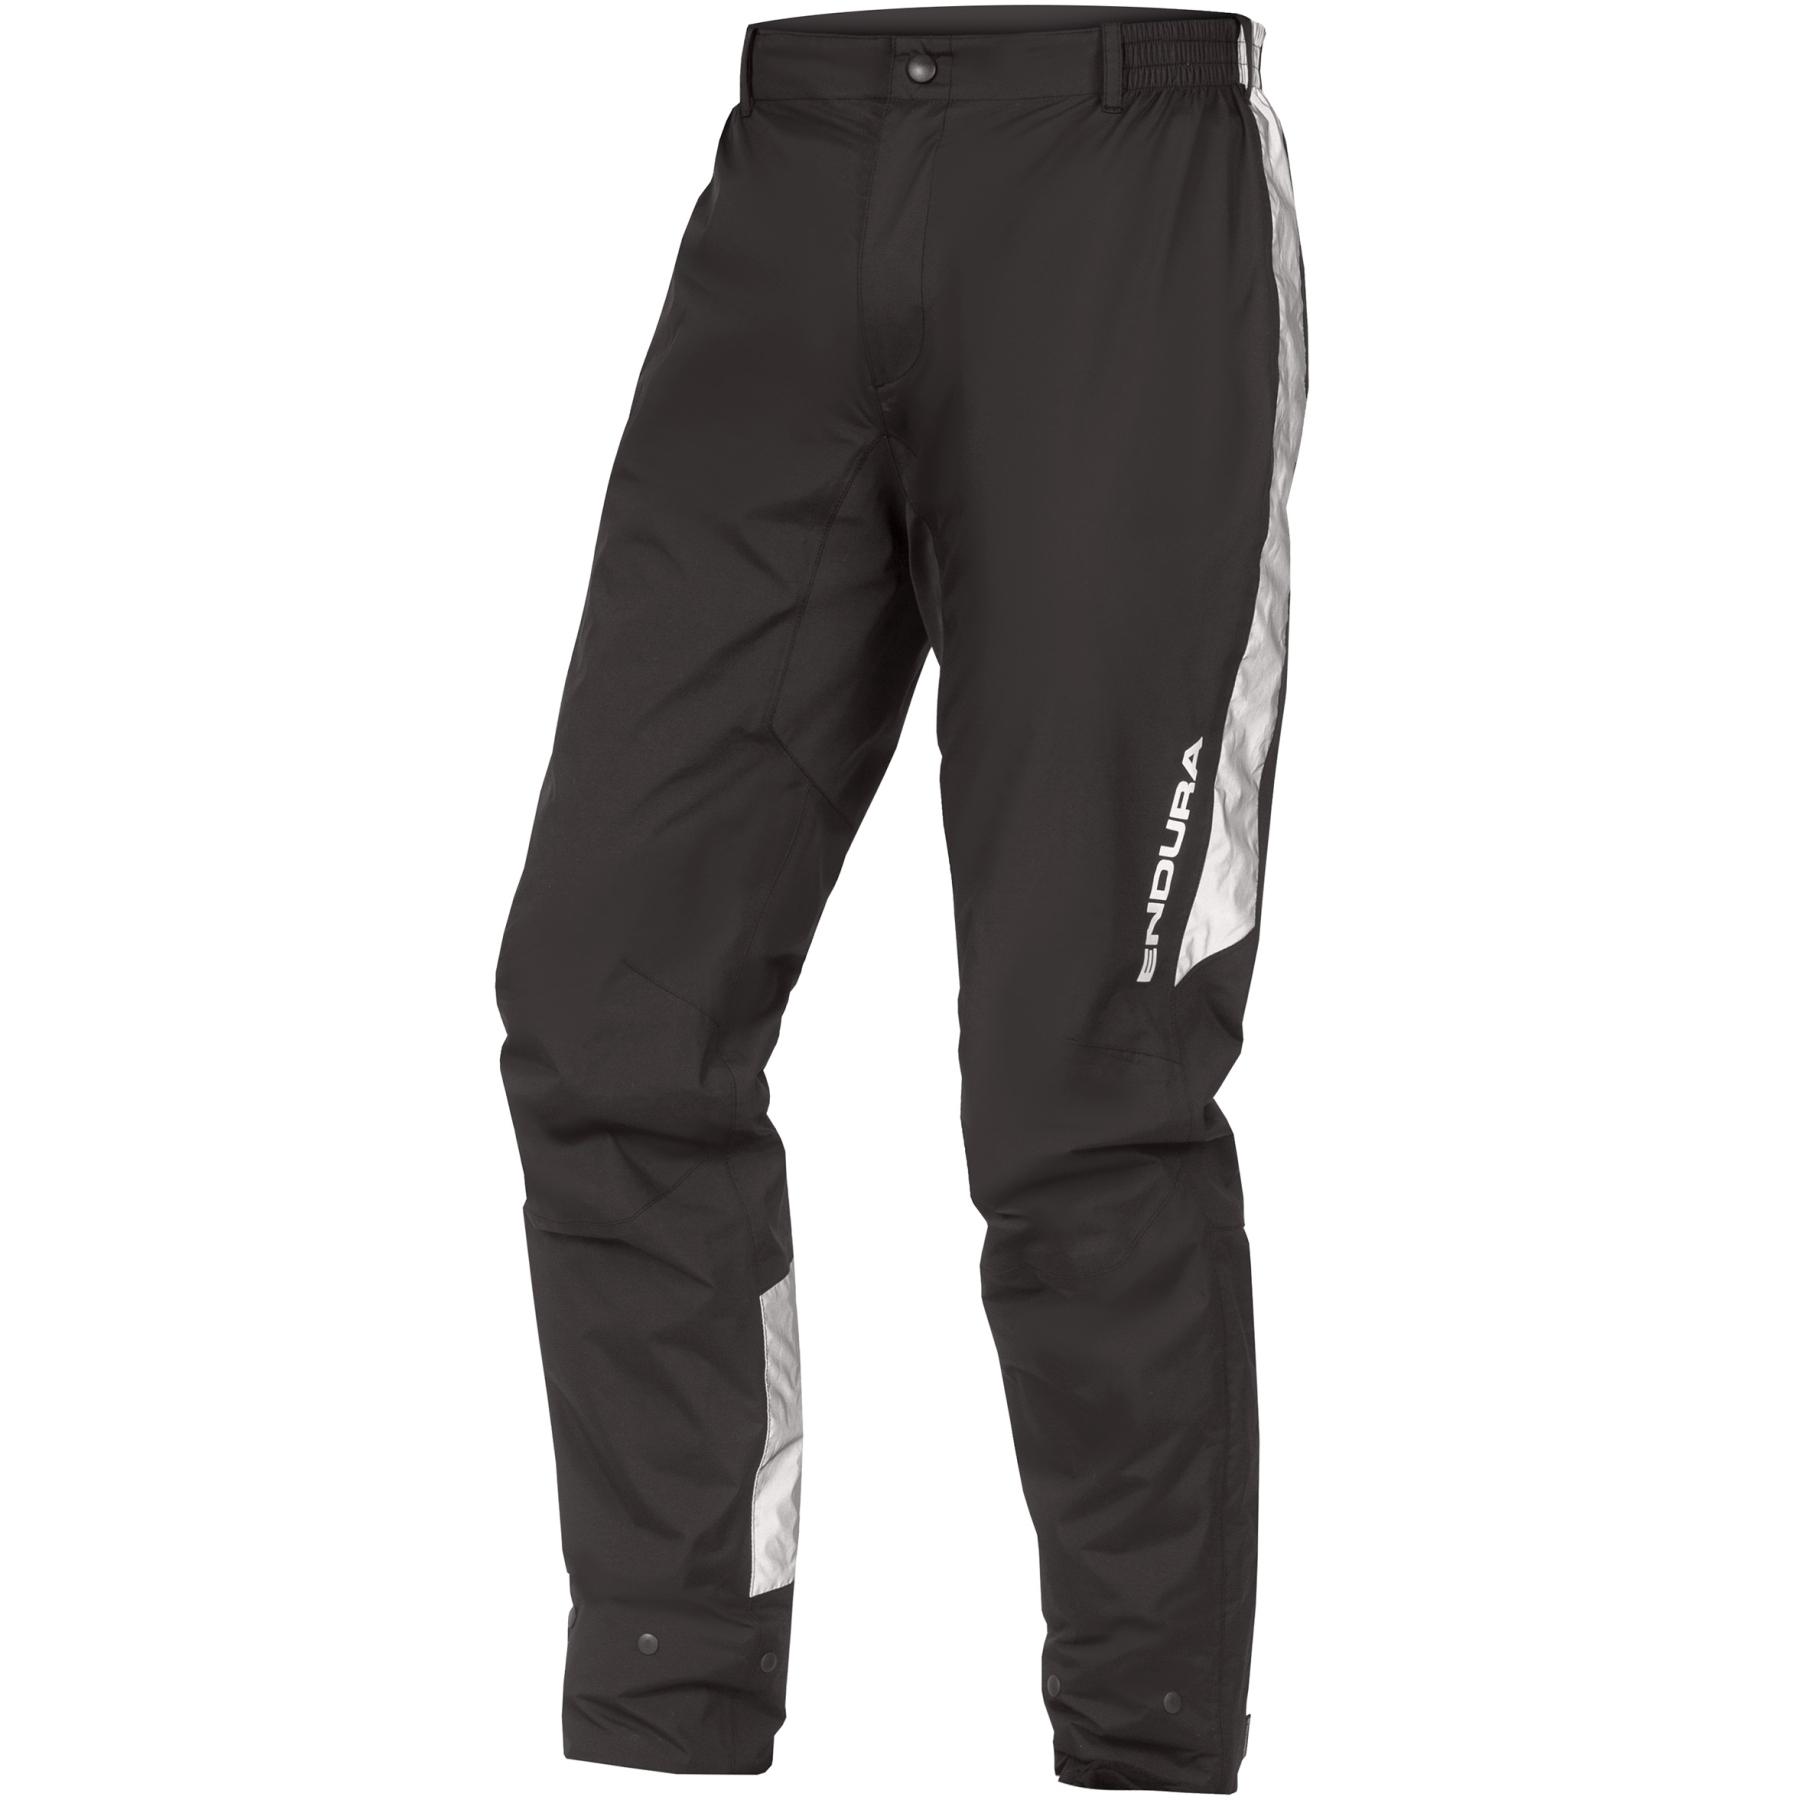 Foto de Endura Urban Luminite Pantalones Impermeables II - anthracite